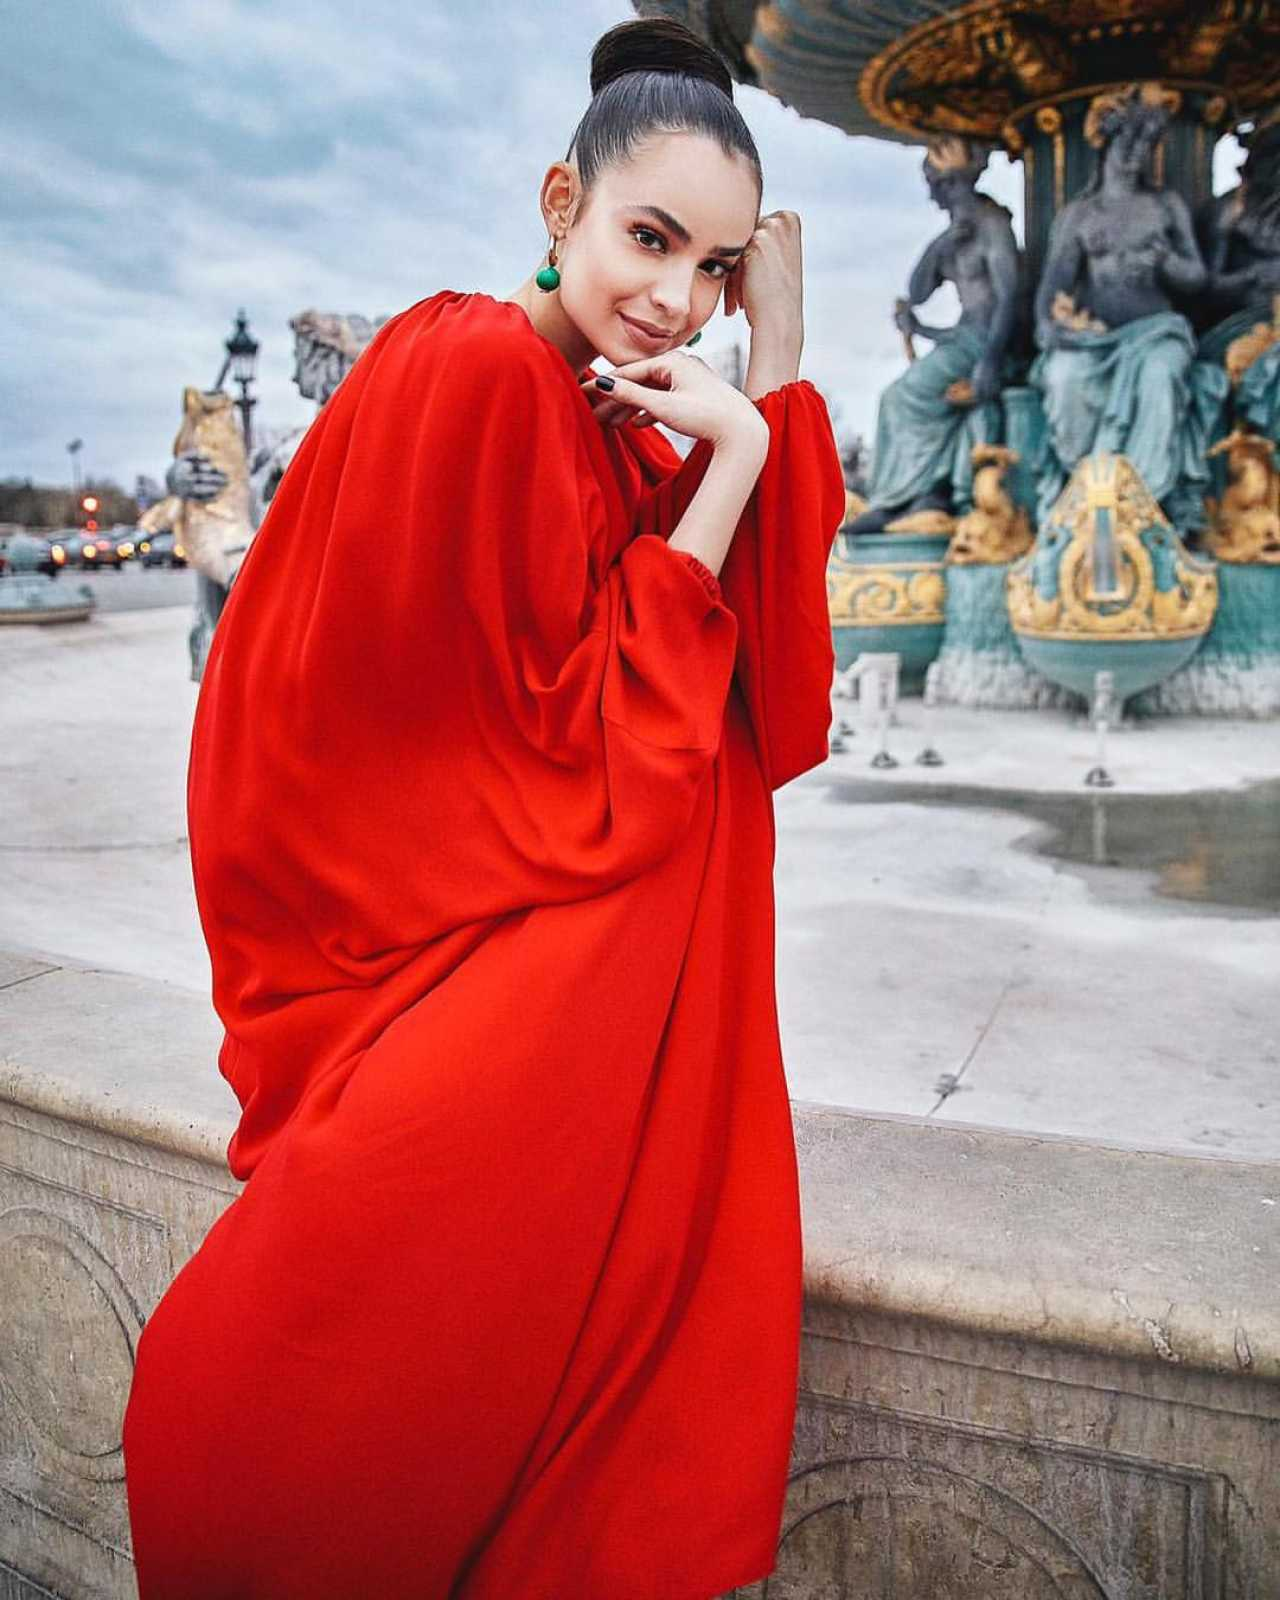 Sofia Carson 2020 : Sofia Carson – Instagram and social media pics-97